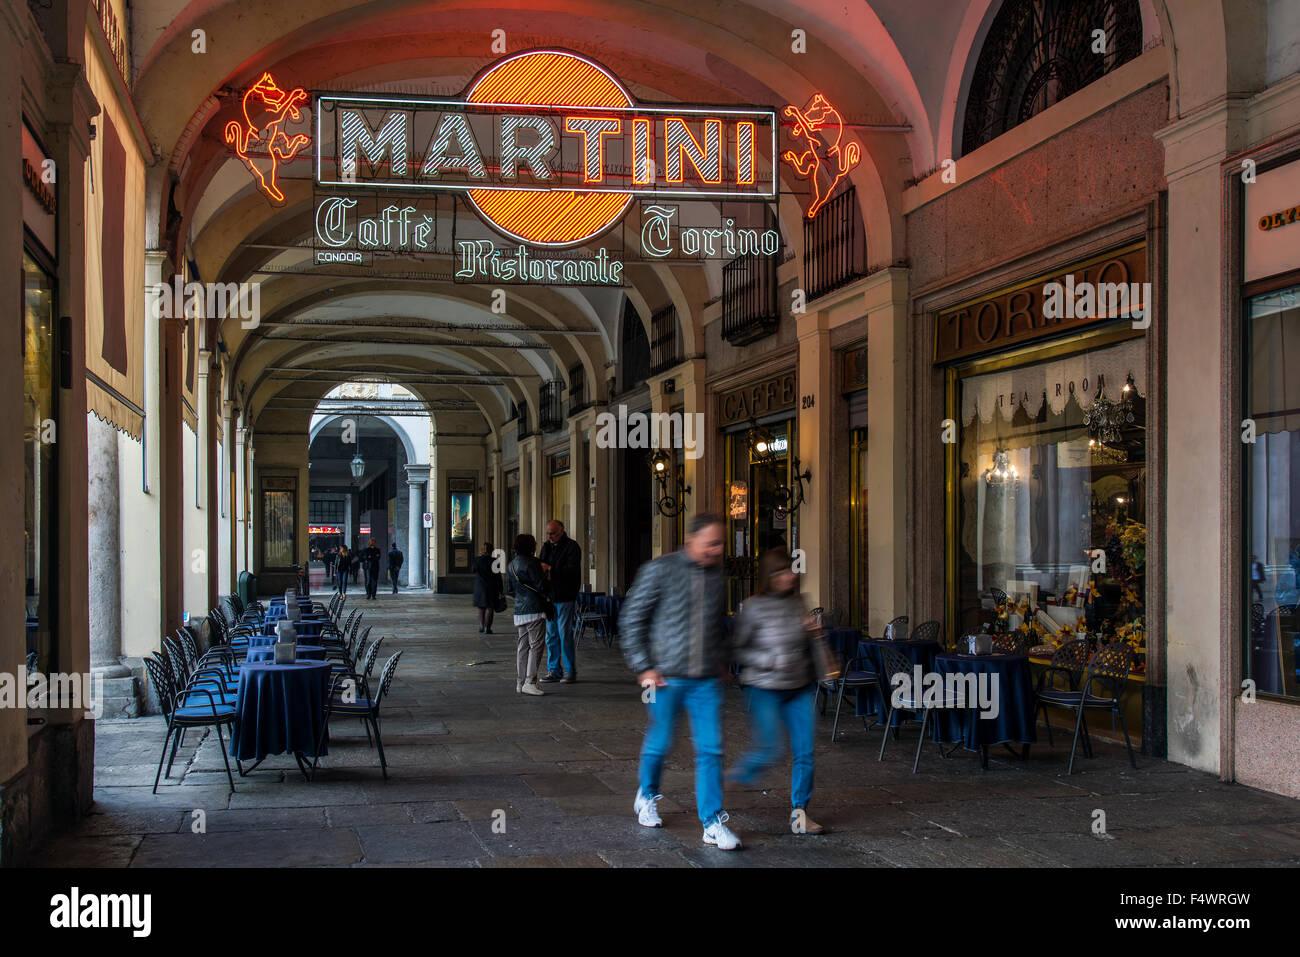 Piazza San Carlo shopping arcade, Turin, Piedmont, Italy - Stock Image